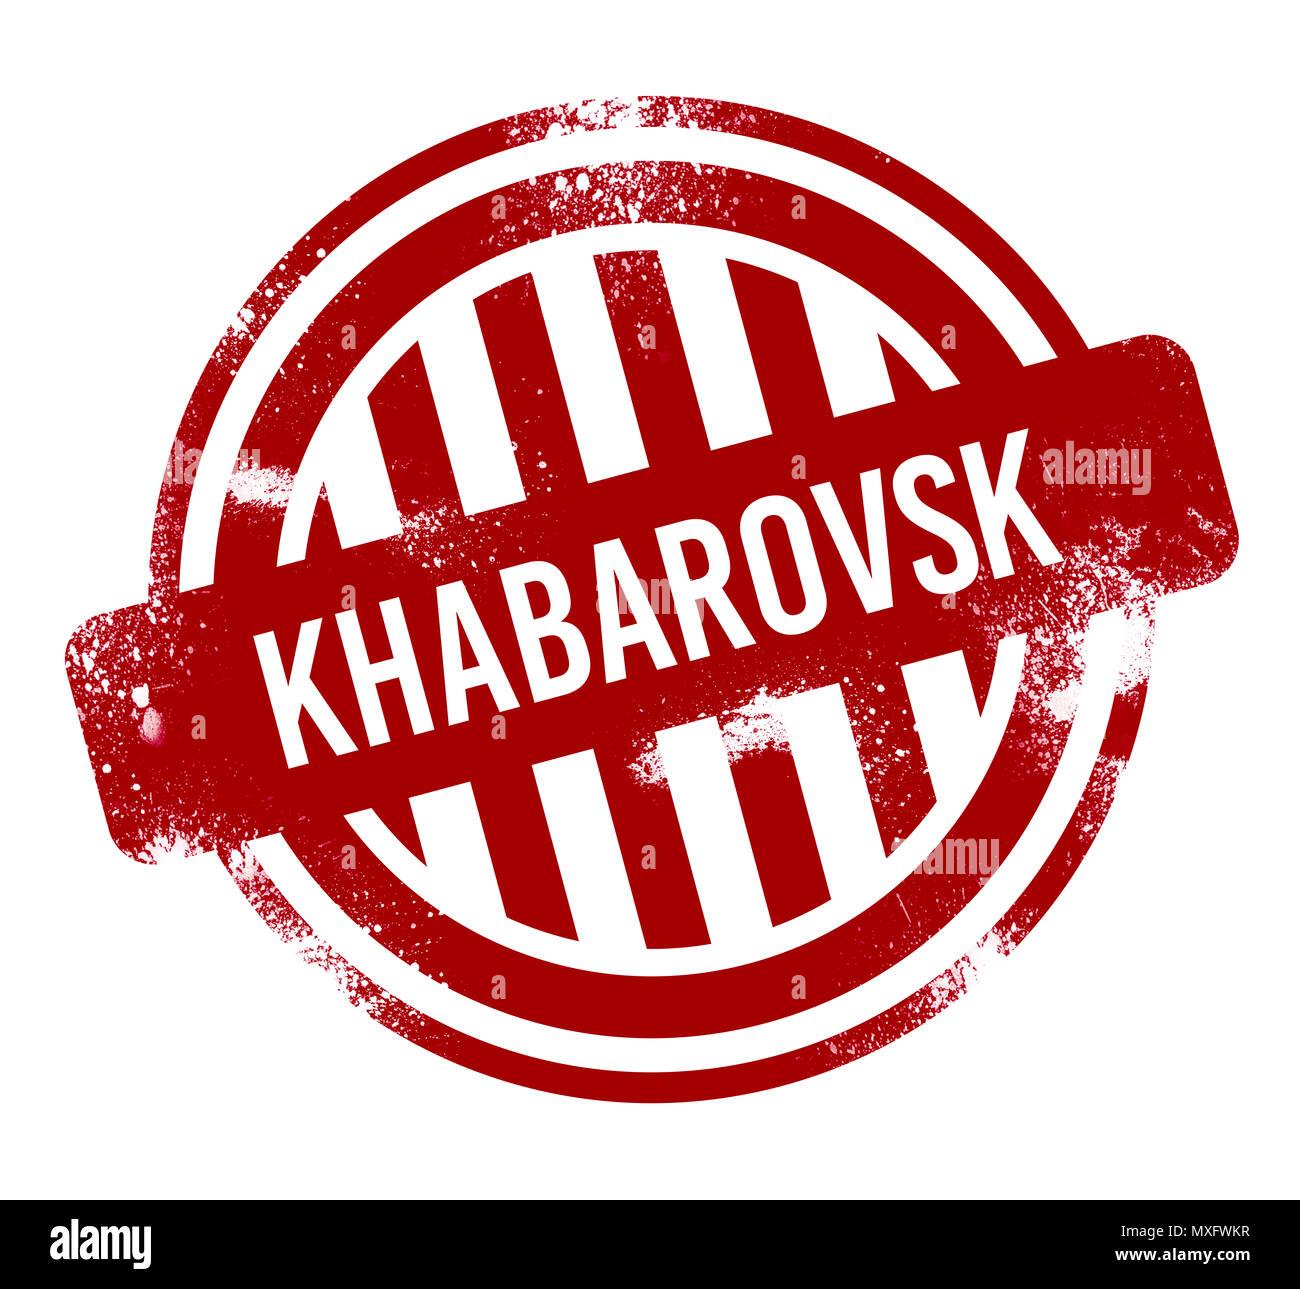 Khabarovsk - Red grunge button, stamp - Stock Image